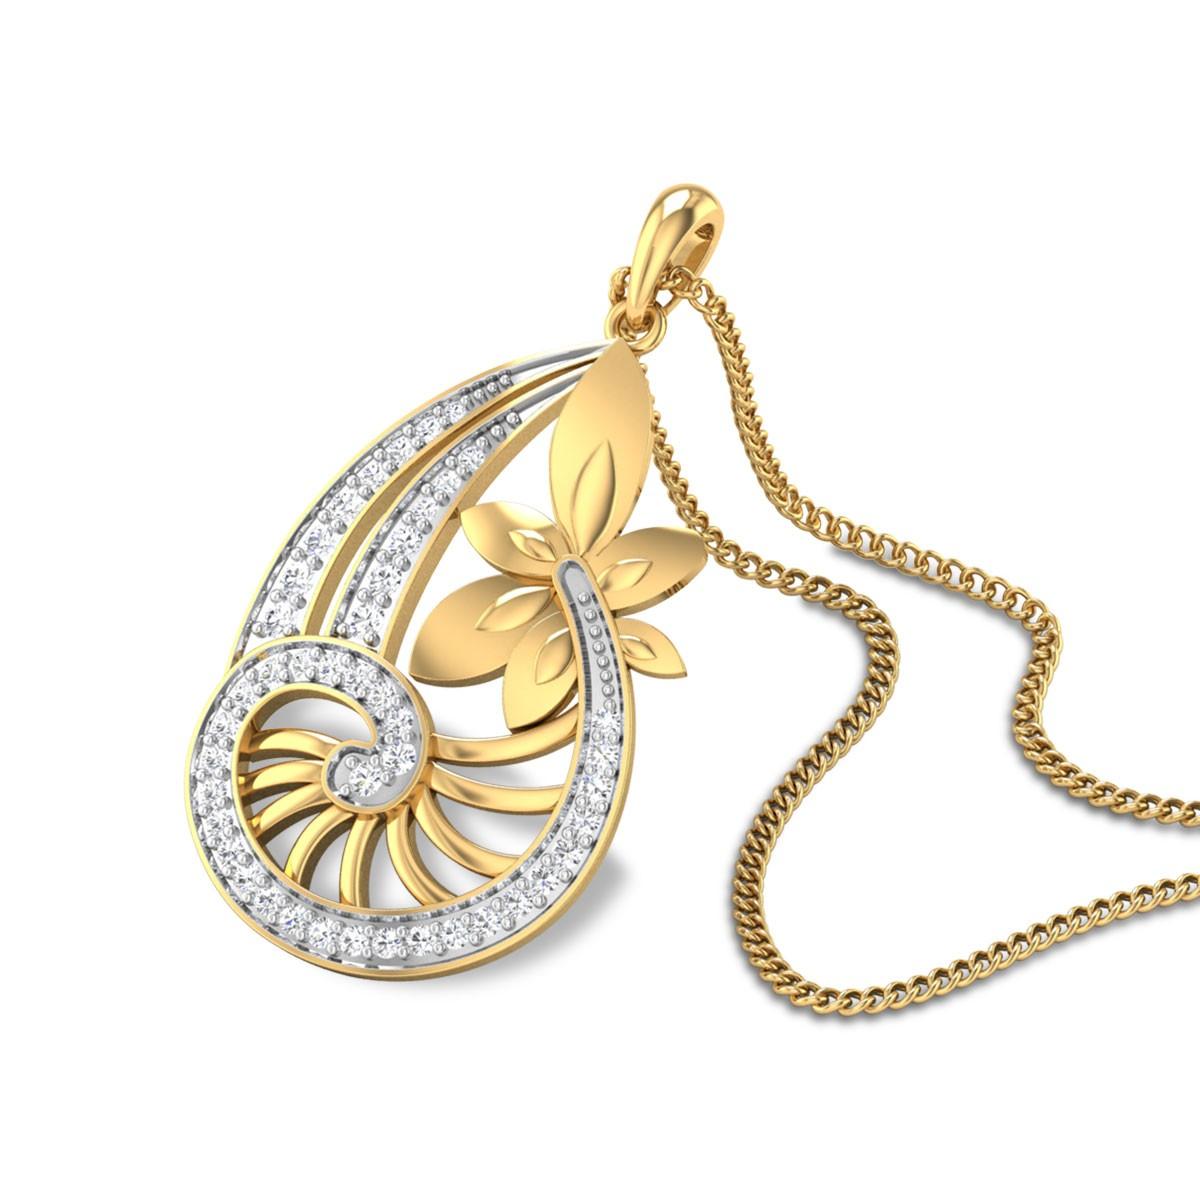 Dieter Floral Diamond Pendant